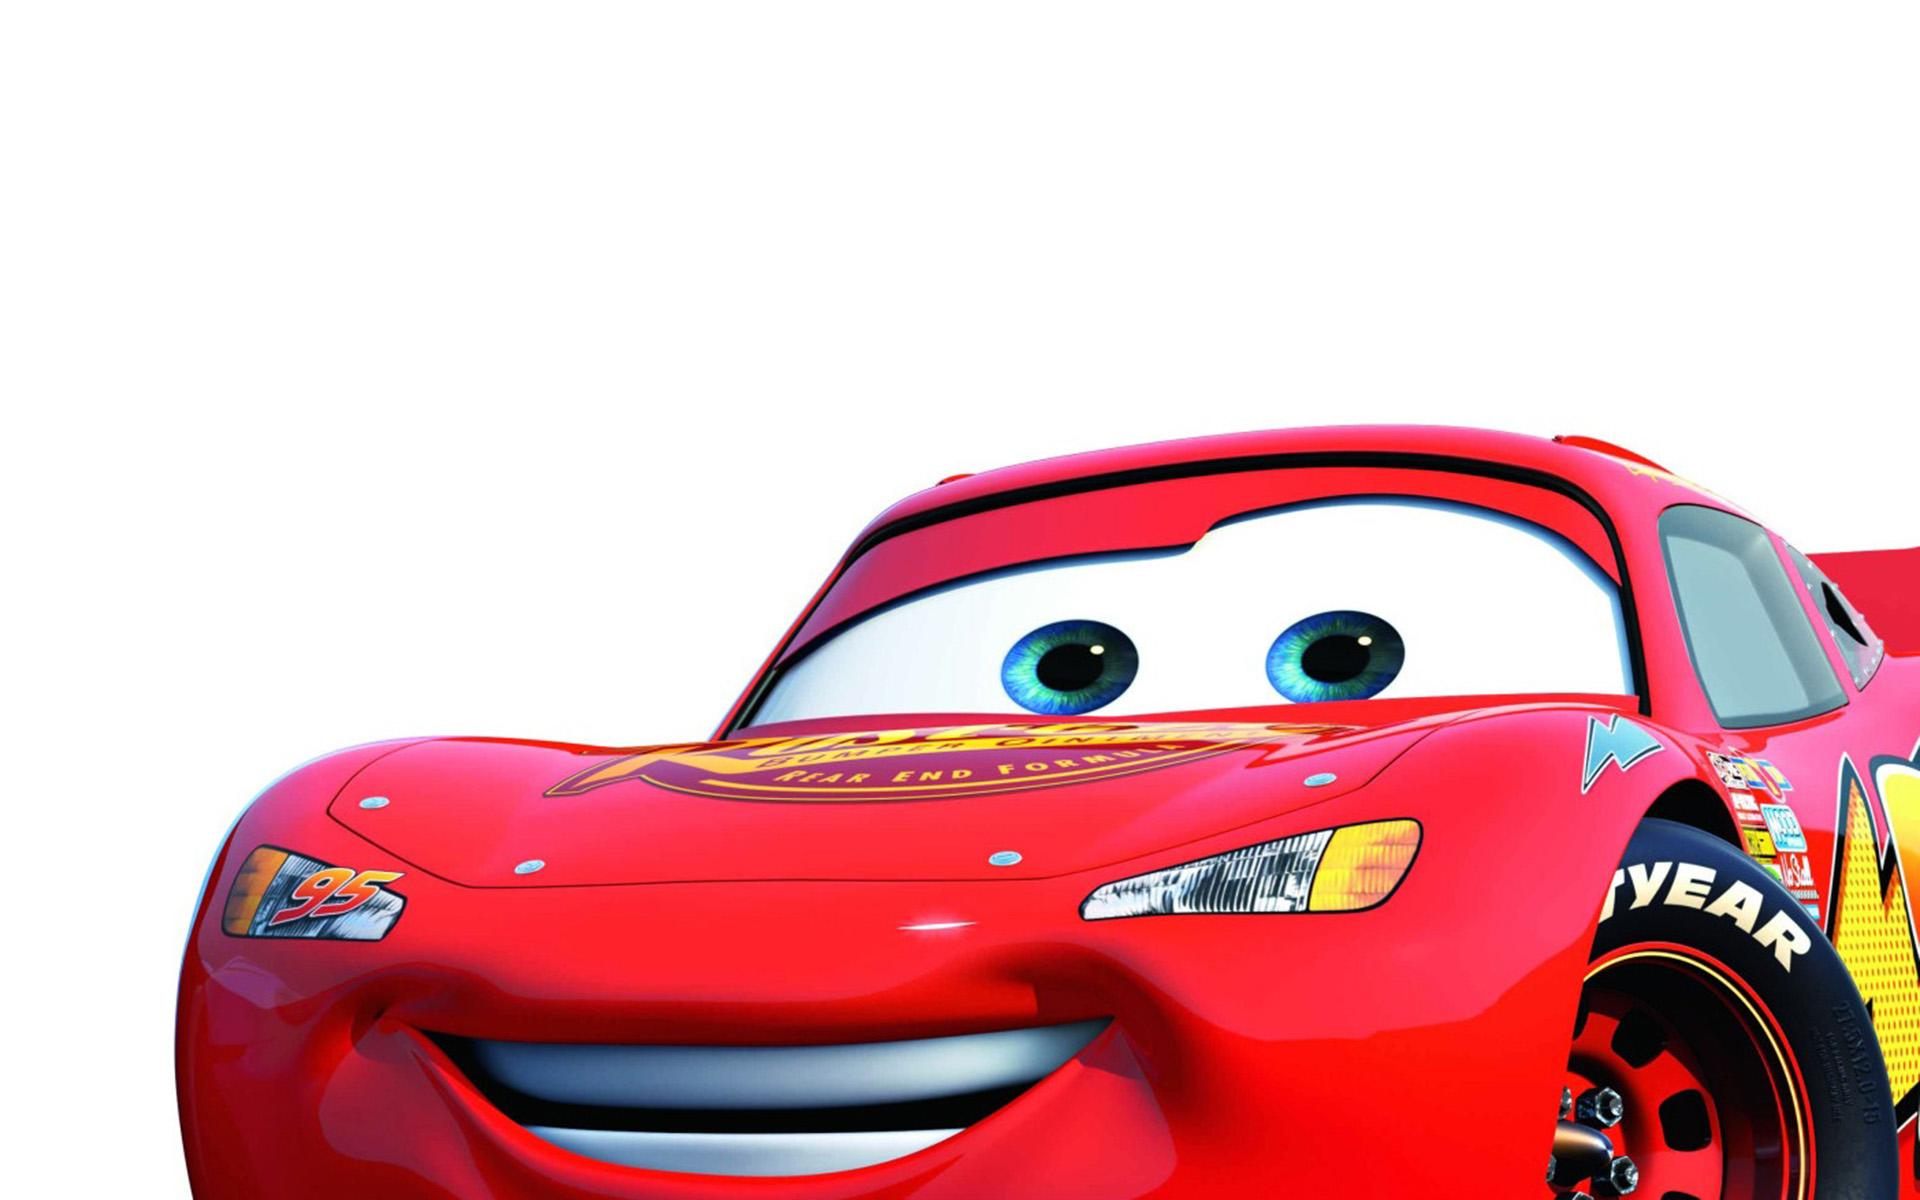 Pixar Cars Desktop Wallpaper Lightning Mcqueen In Cars 2 14181 1920x1200 Px